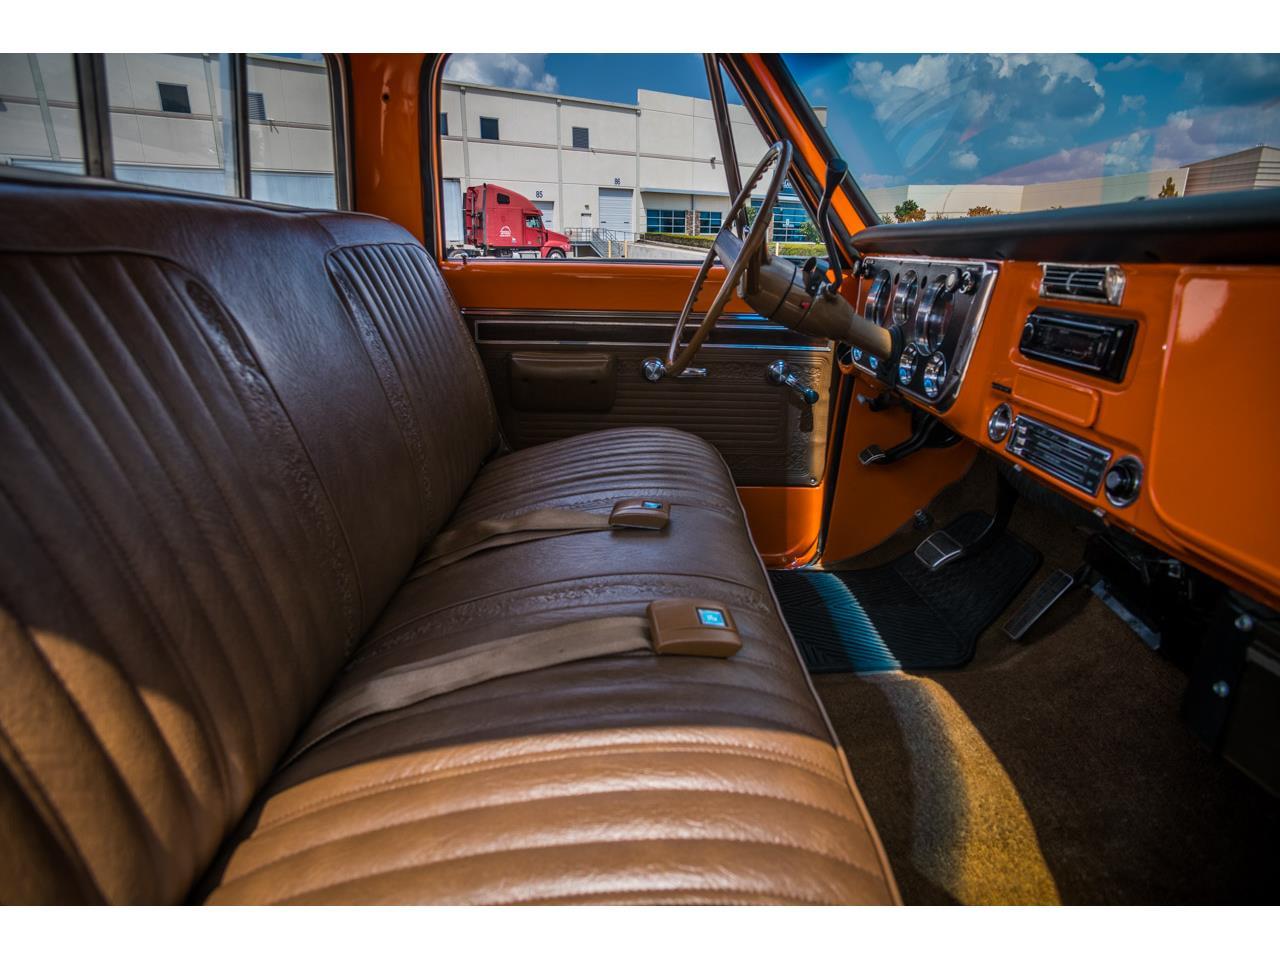 1971 Chevrolet Cheyenne (CC-1341526) for sale in O'Fallon, Illinois